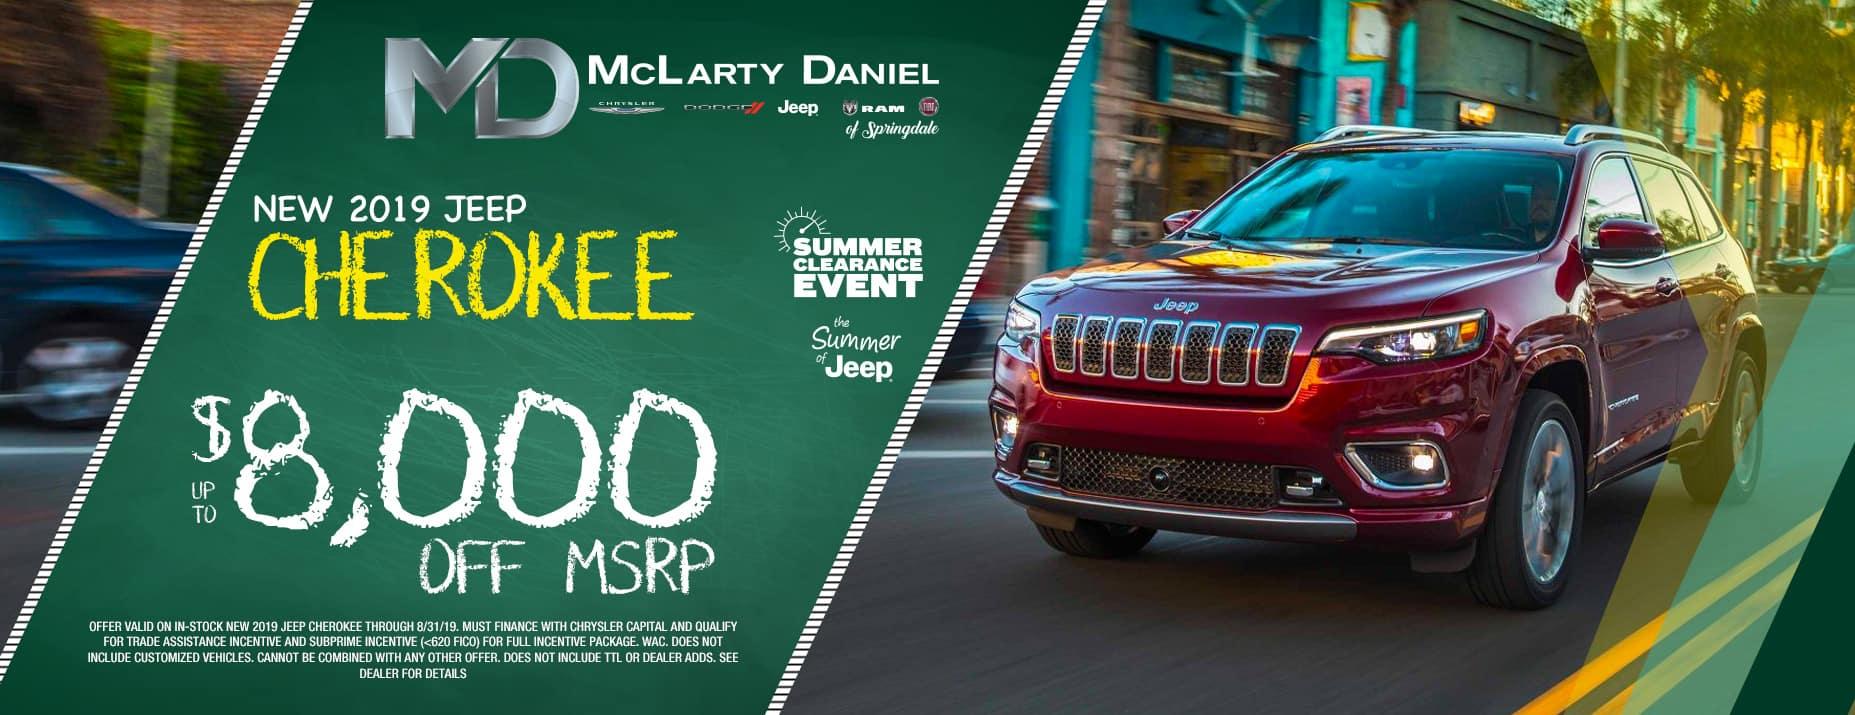 2019 Jeep Cherokee  $8000 Off MSRP